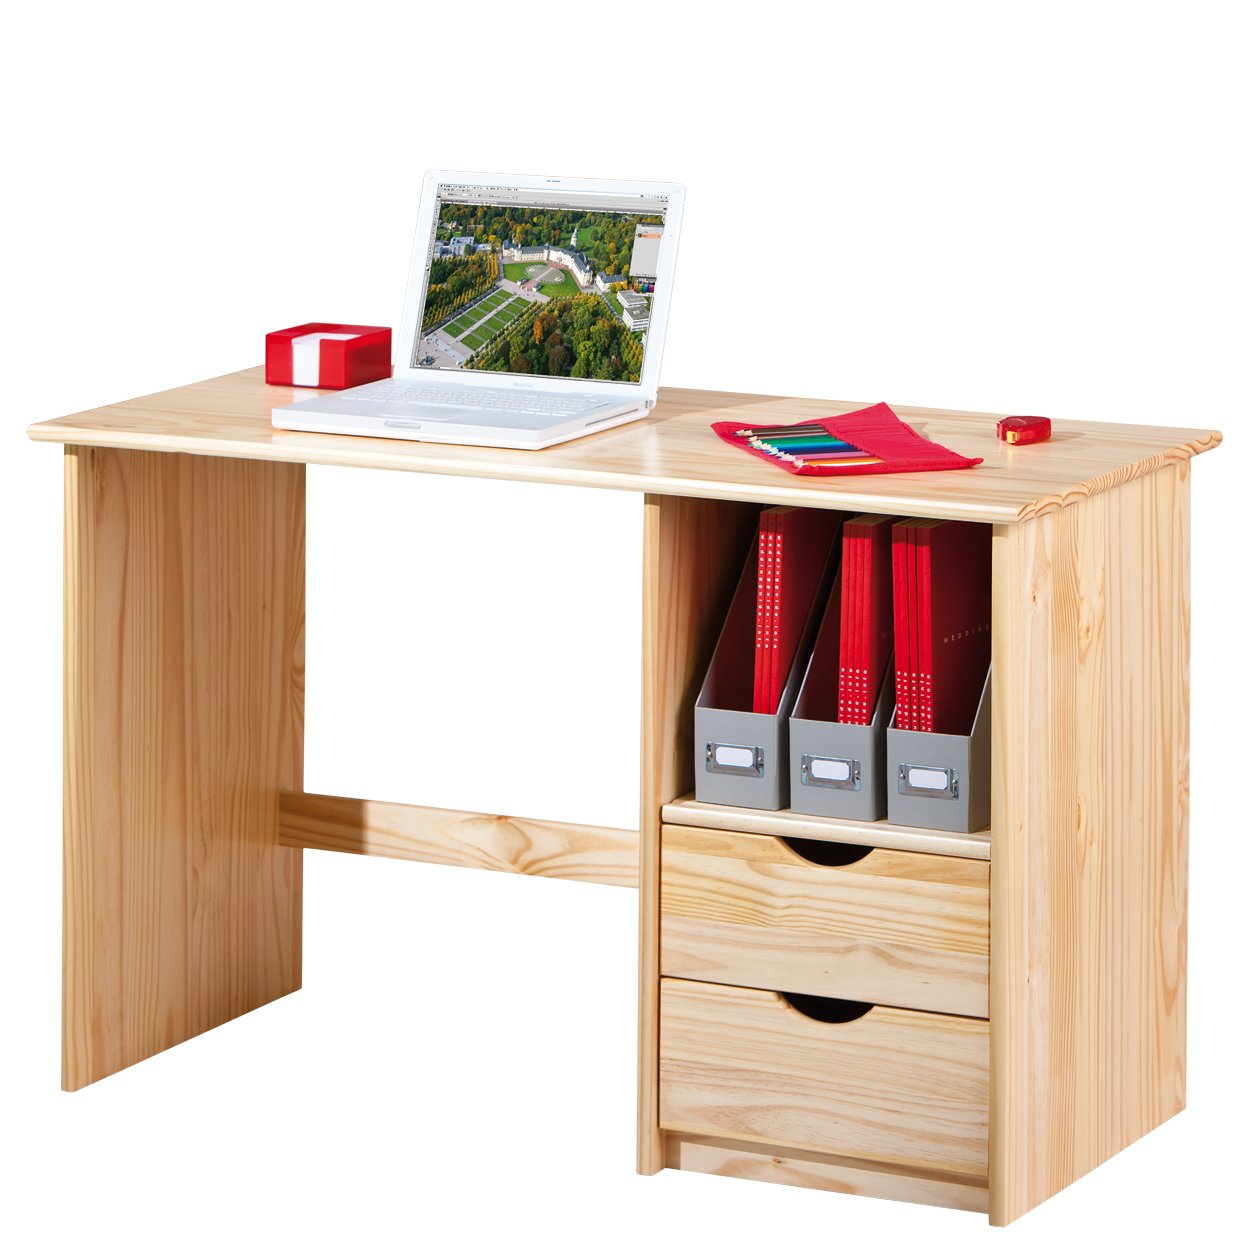 Inter Link Alpine Living Holzschreibtisch Computertisch Büromöbel ...